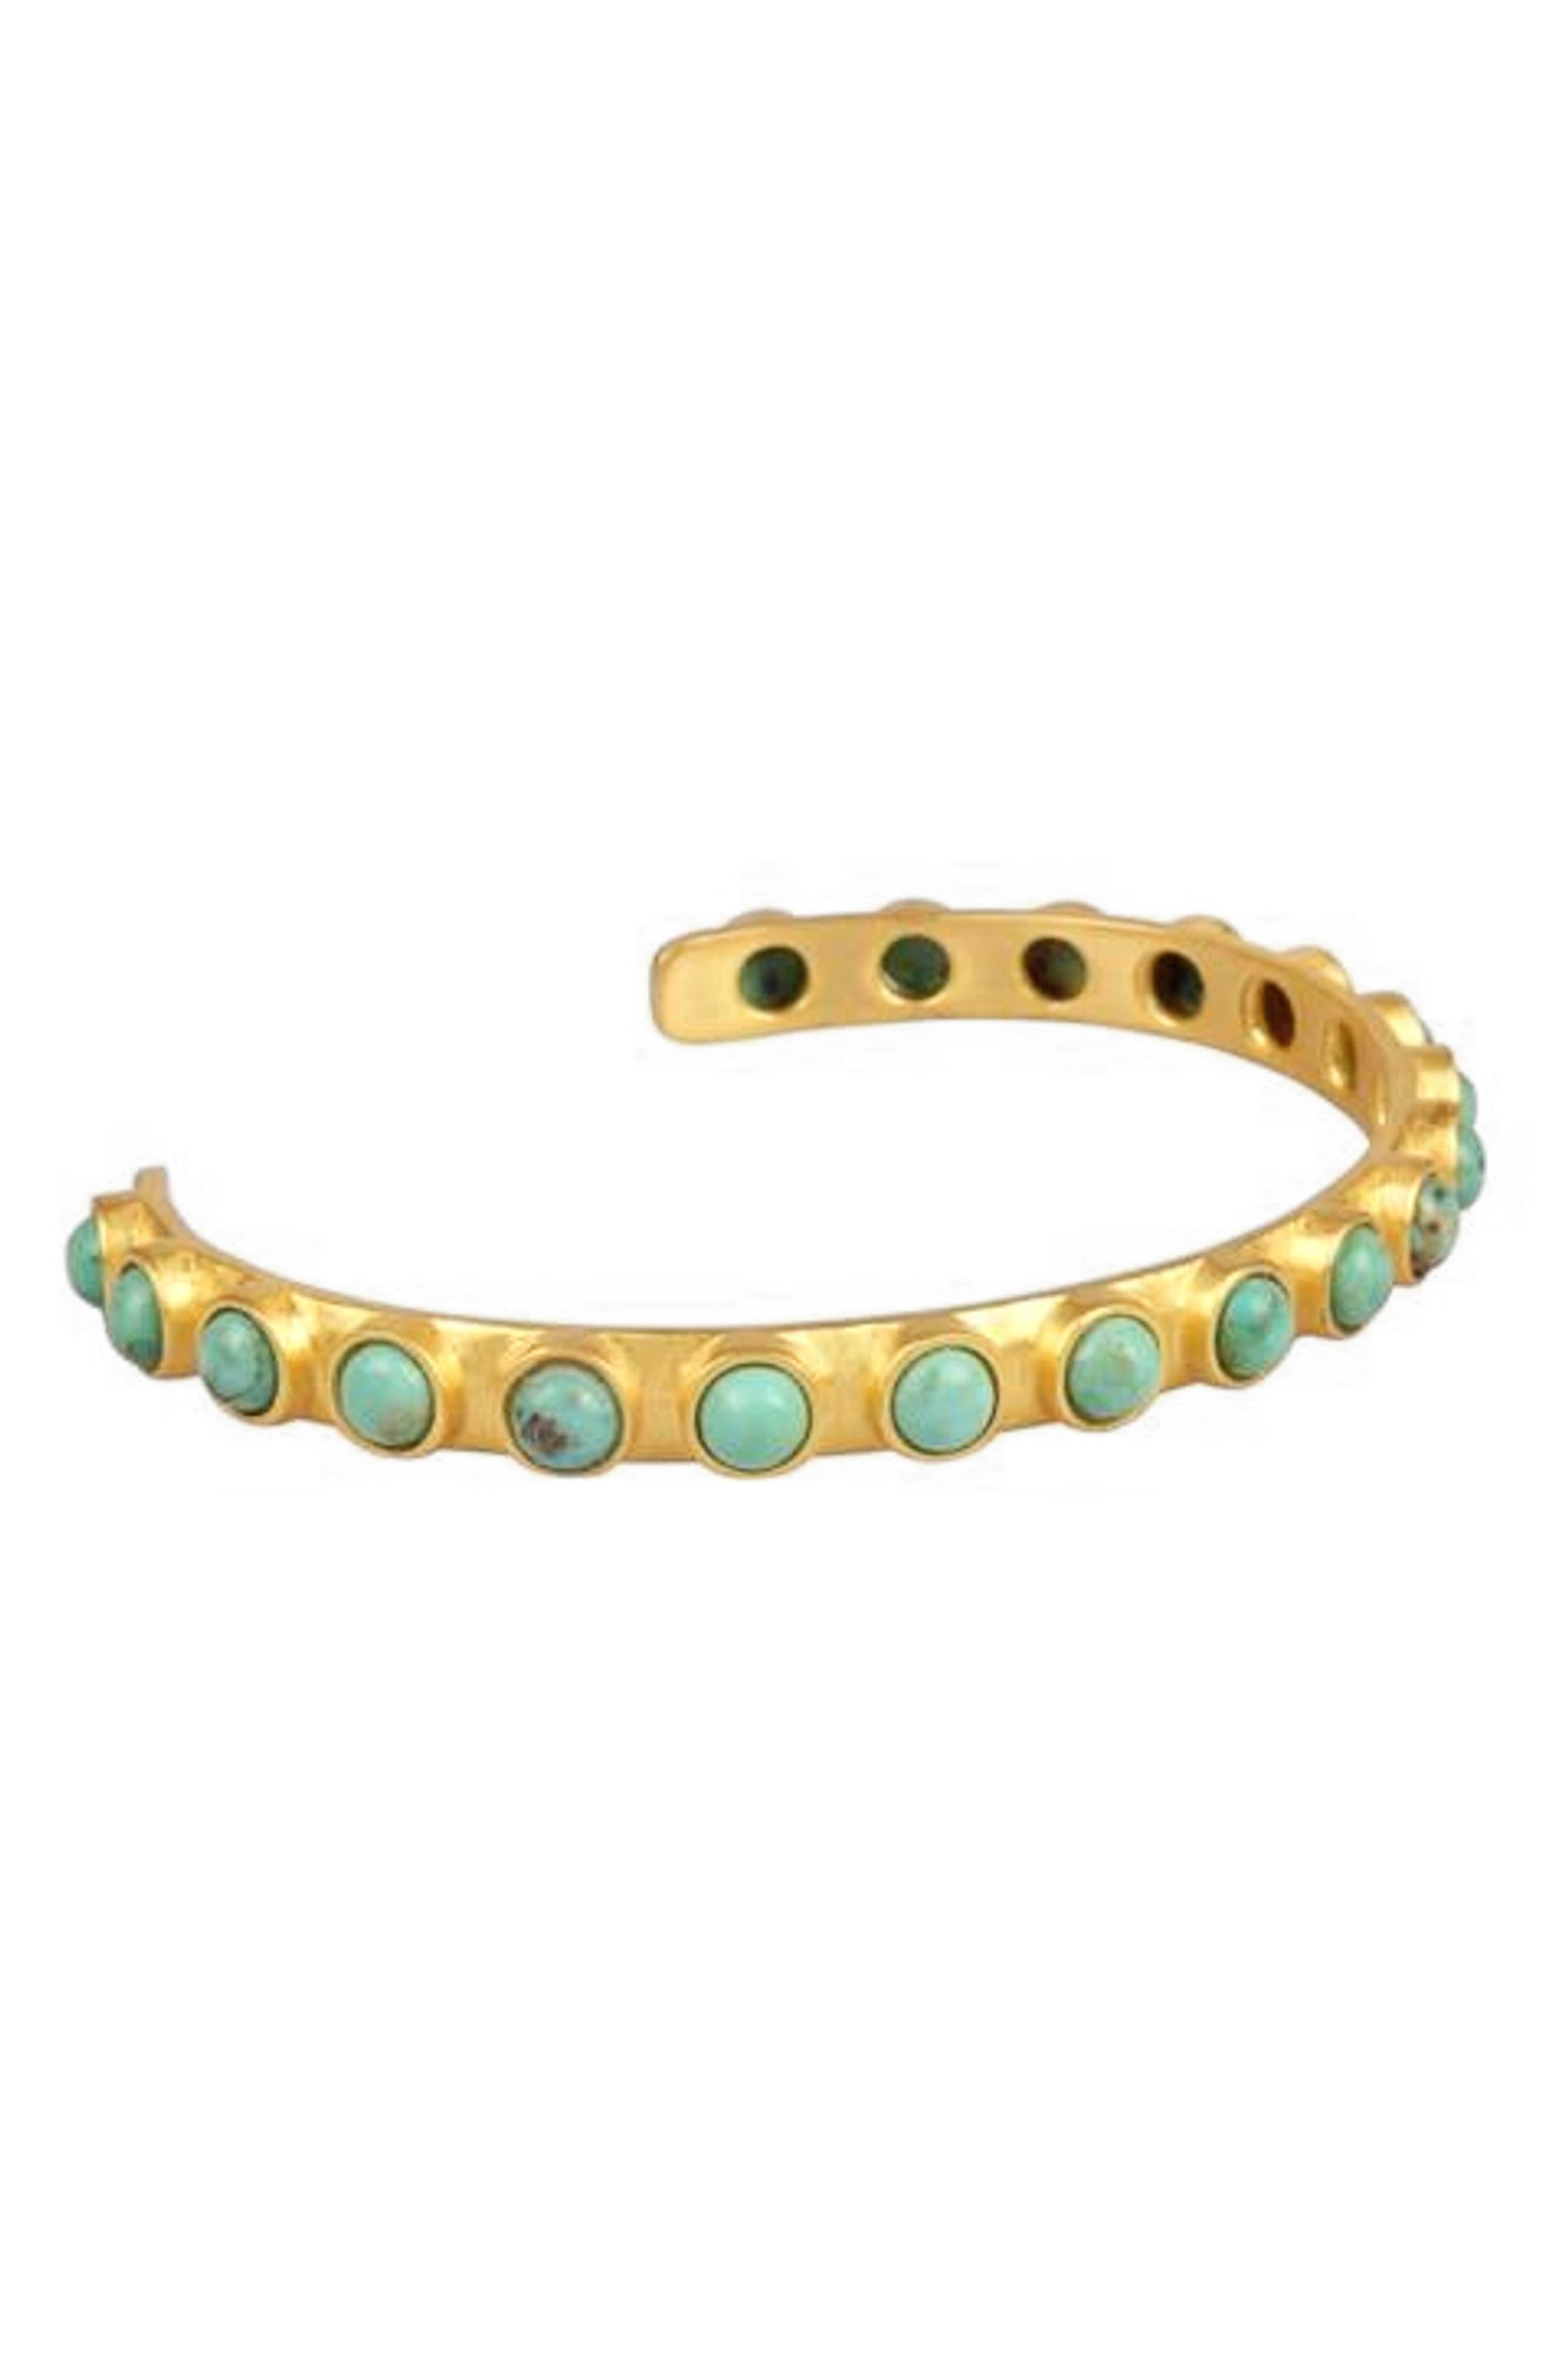 Turquoise Studded Cuff Bracelet